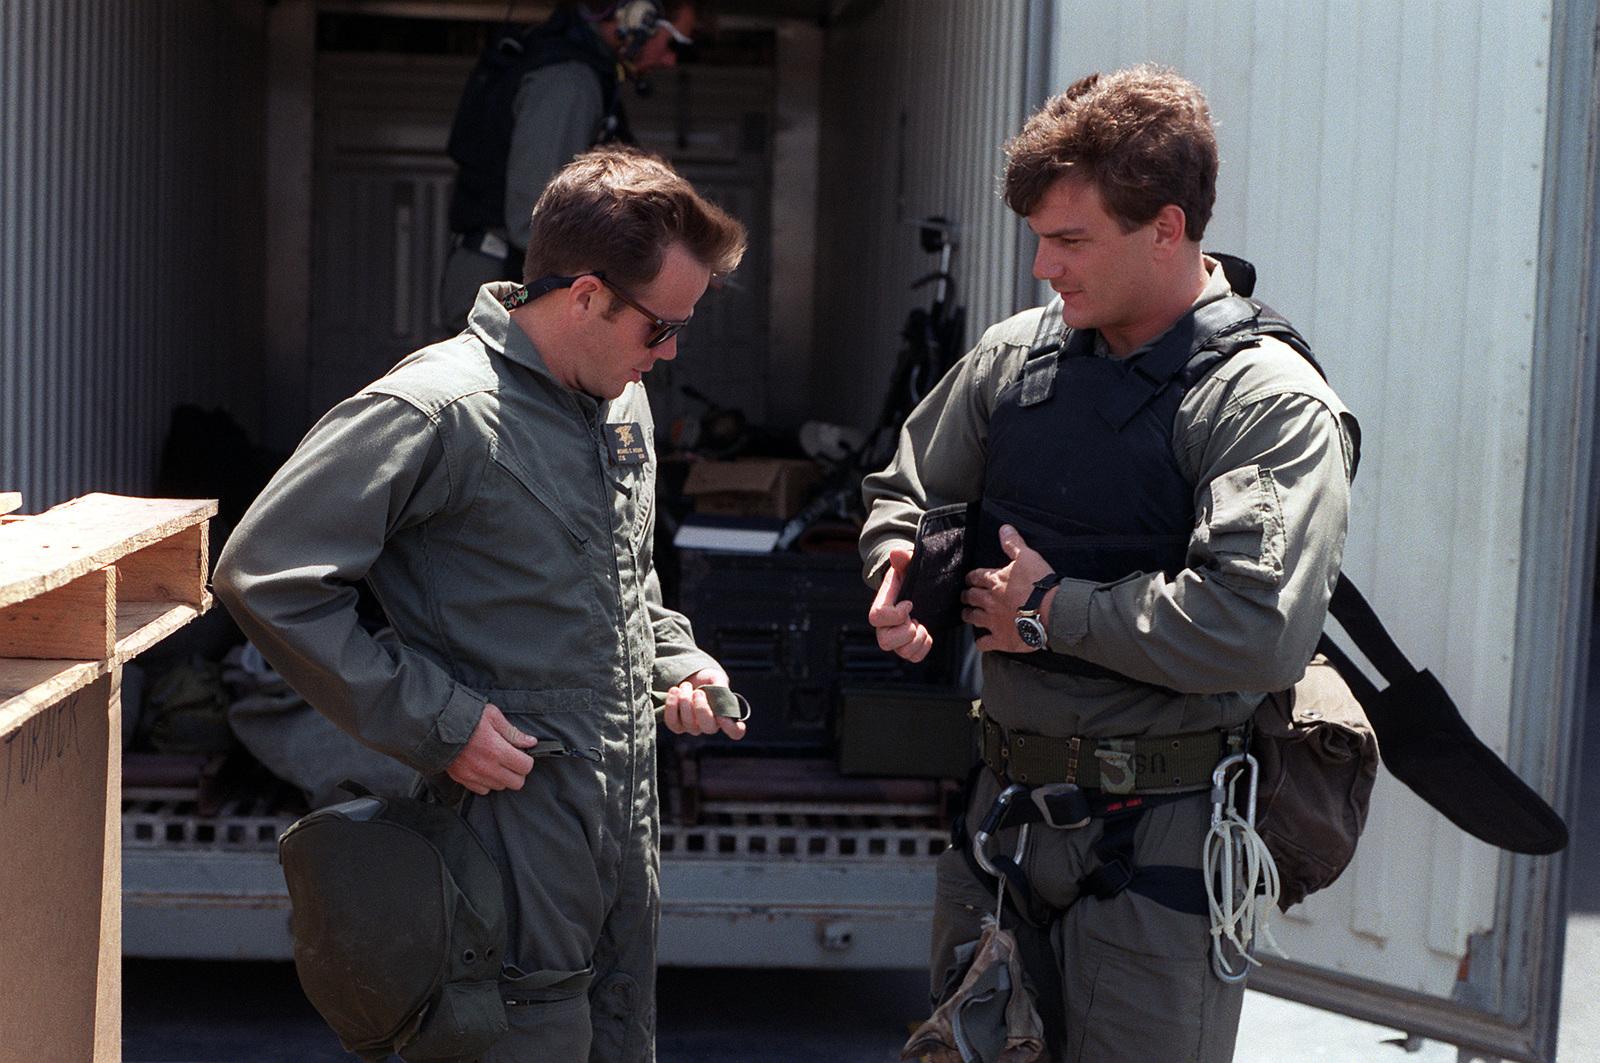 Members of Sea-Air-Land (SEAL) Team 8 prepare for a training